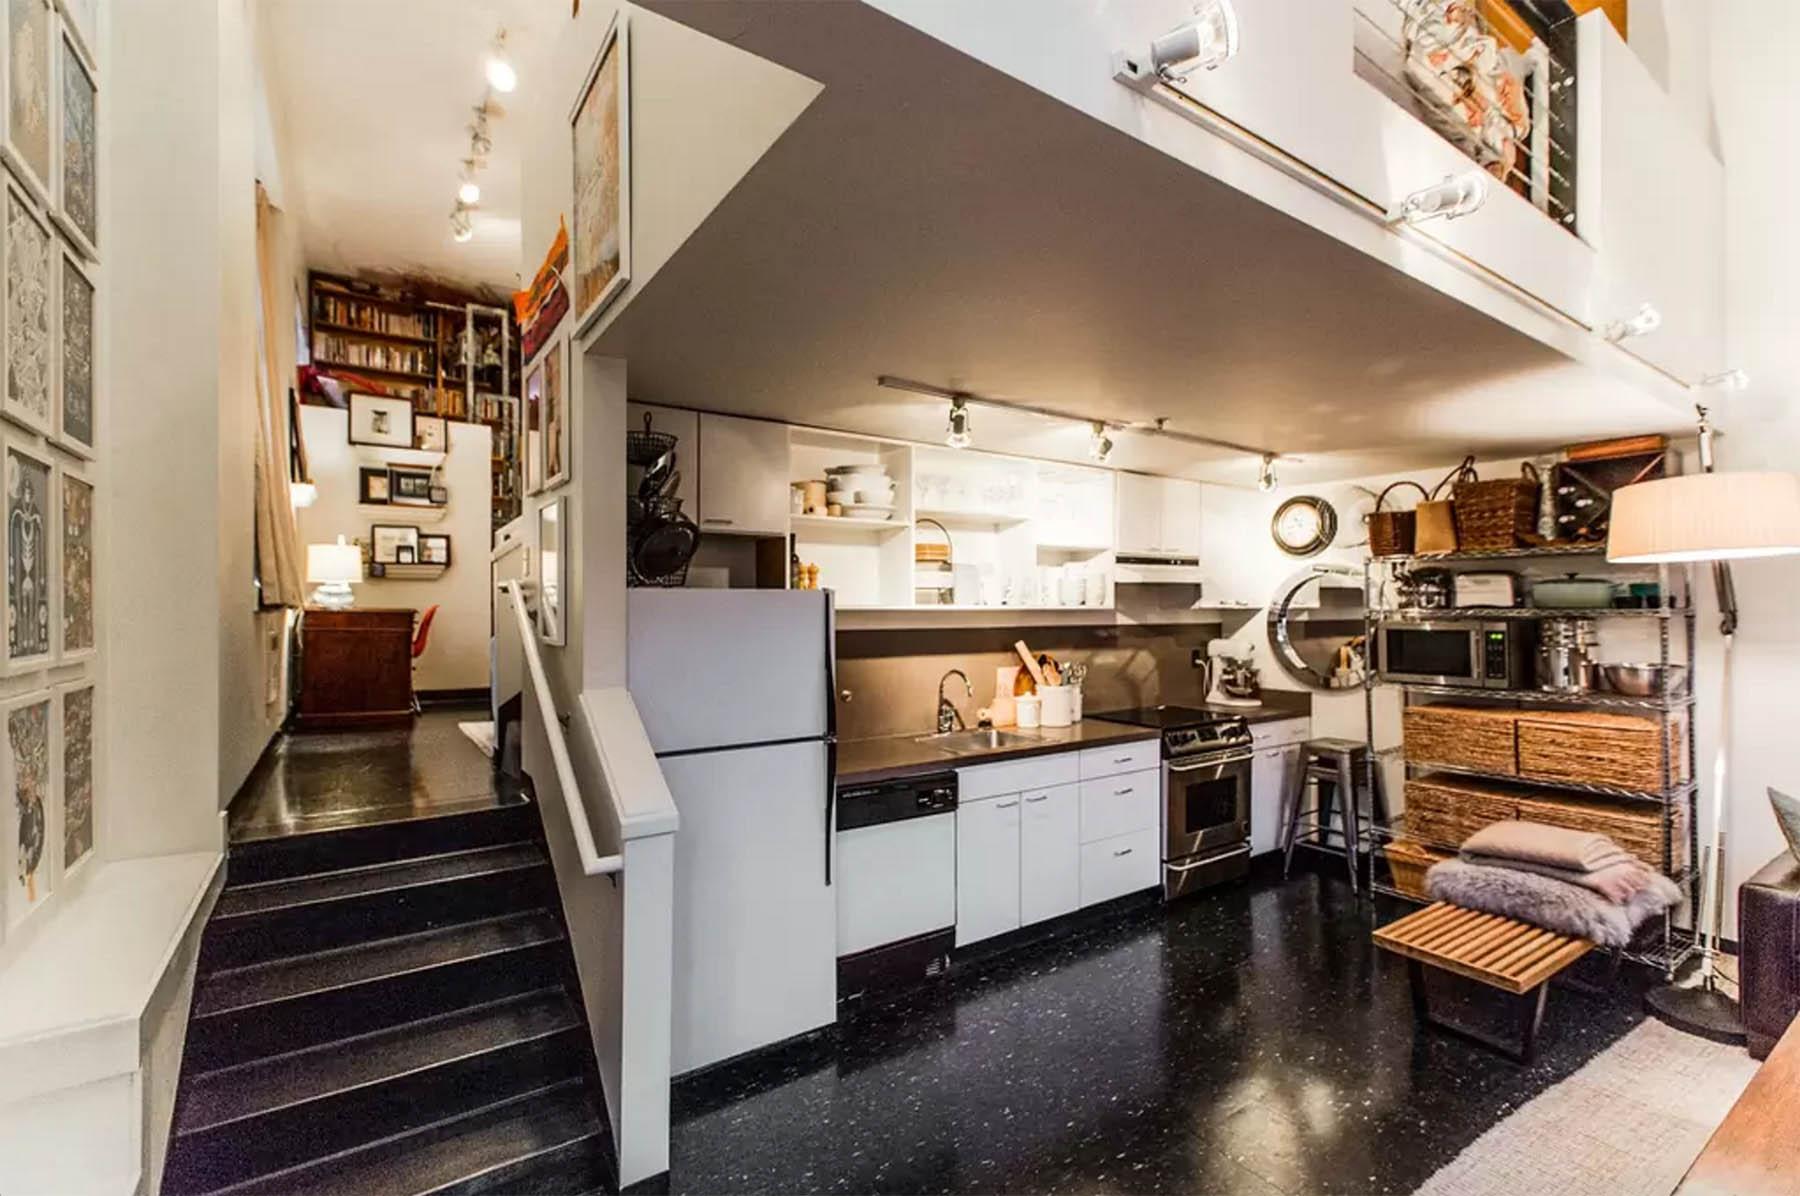 seattle airbnb artist's loft